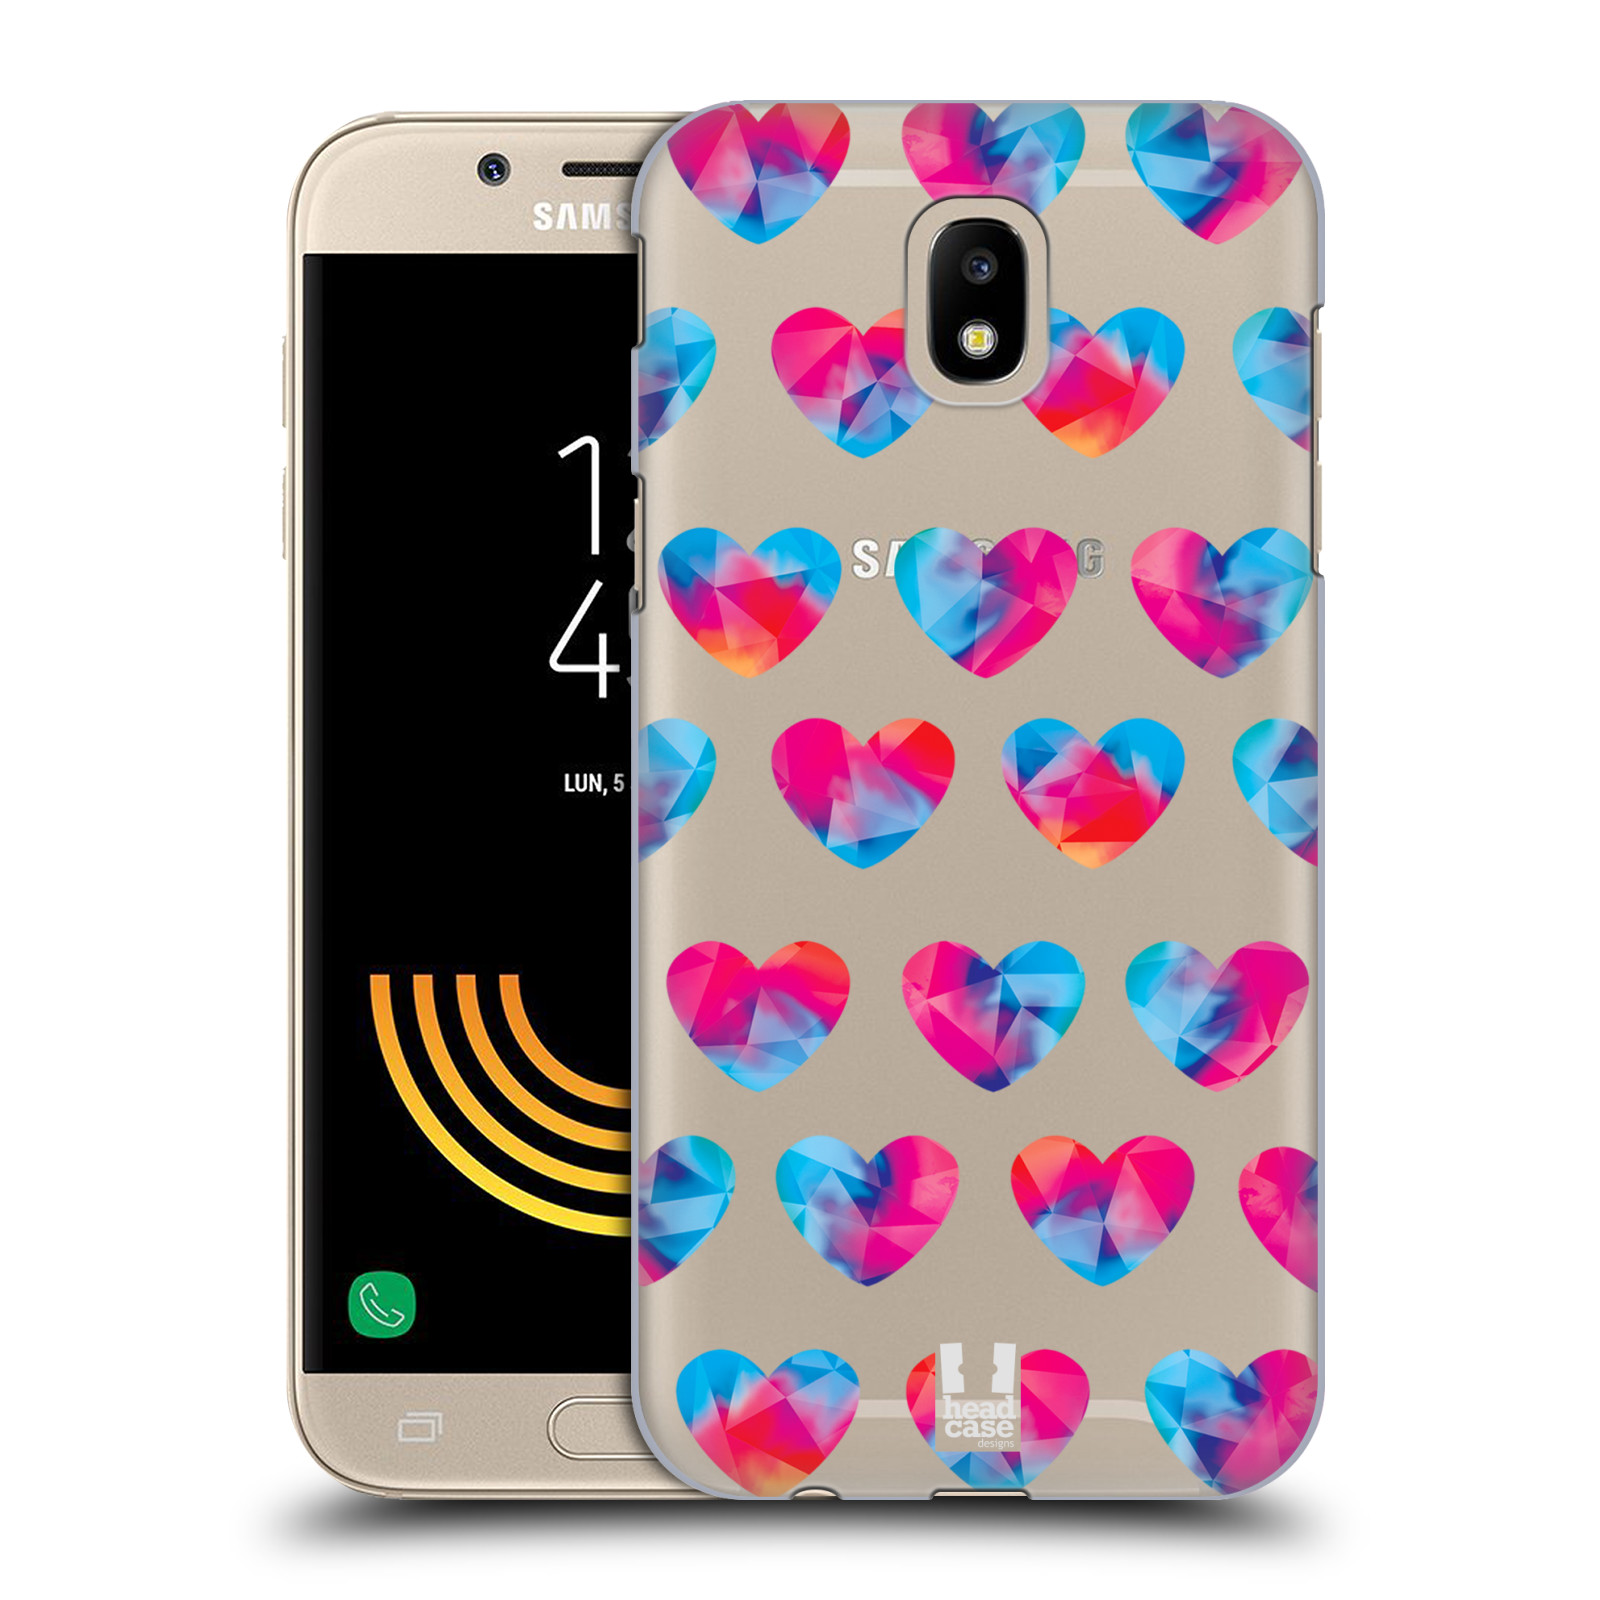 Plastové pouzdro na mobil Samsung Galaxy J5 (2017) - Head Case - Srdíčka hrající barvami